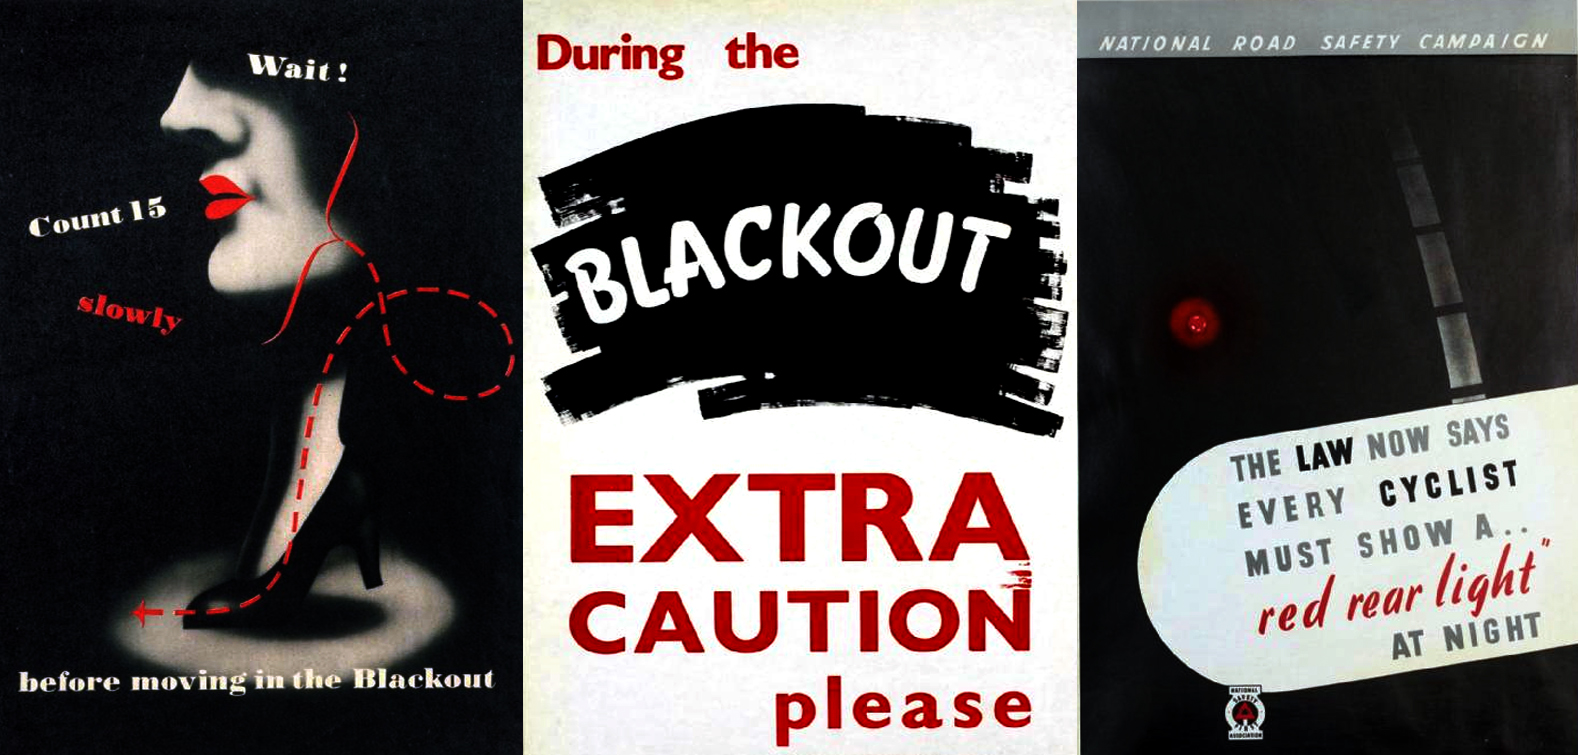 Blackout curtains ww2 -  Image Source